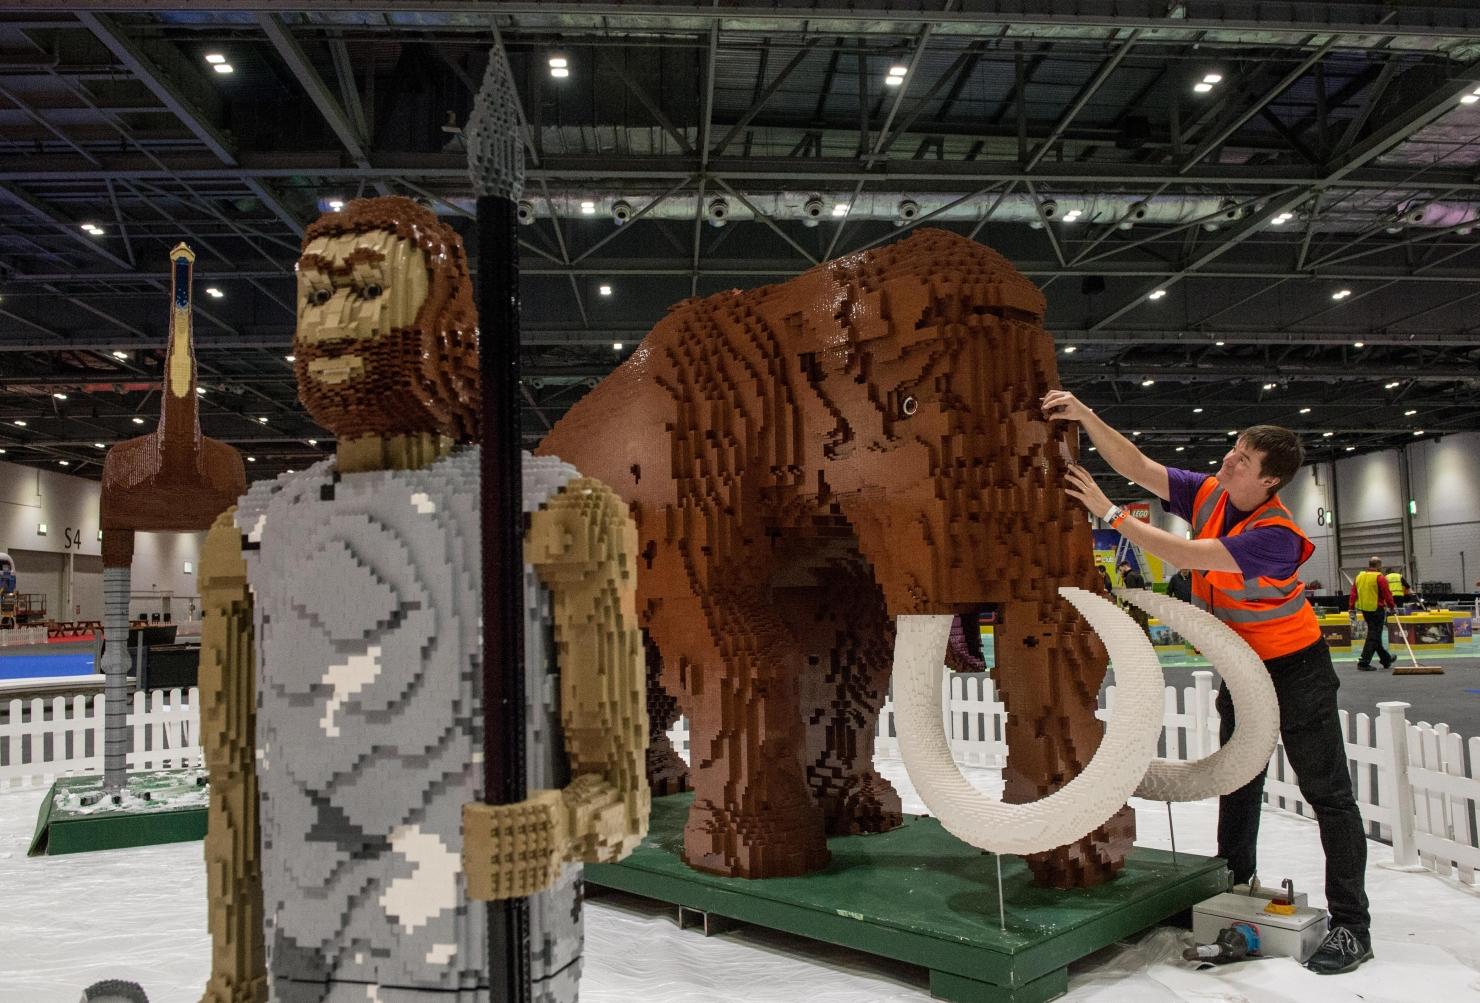 Ultimele retușuri la expoziția Lego 2015